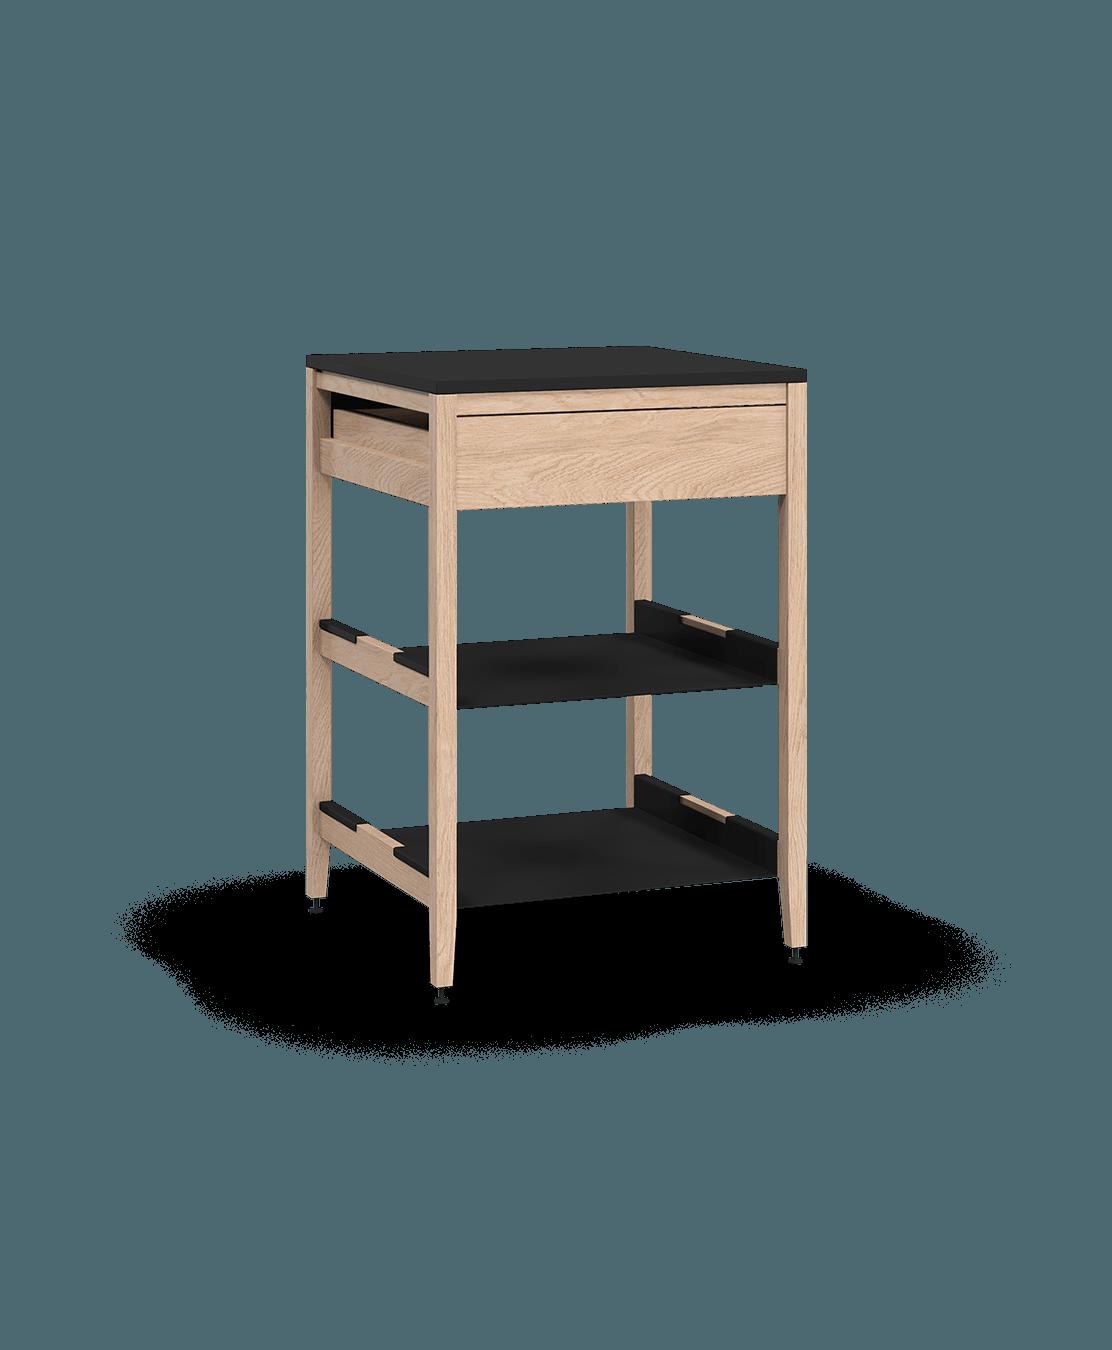 coquo radix white oak solid wood modular 2 shelves 1 drawer base kitchen cabinet 24 inch C1-C-24SB-1022-NA